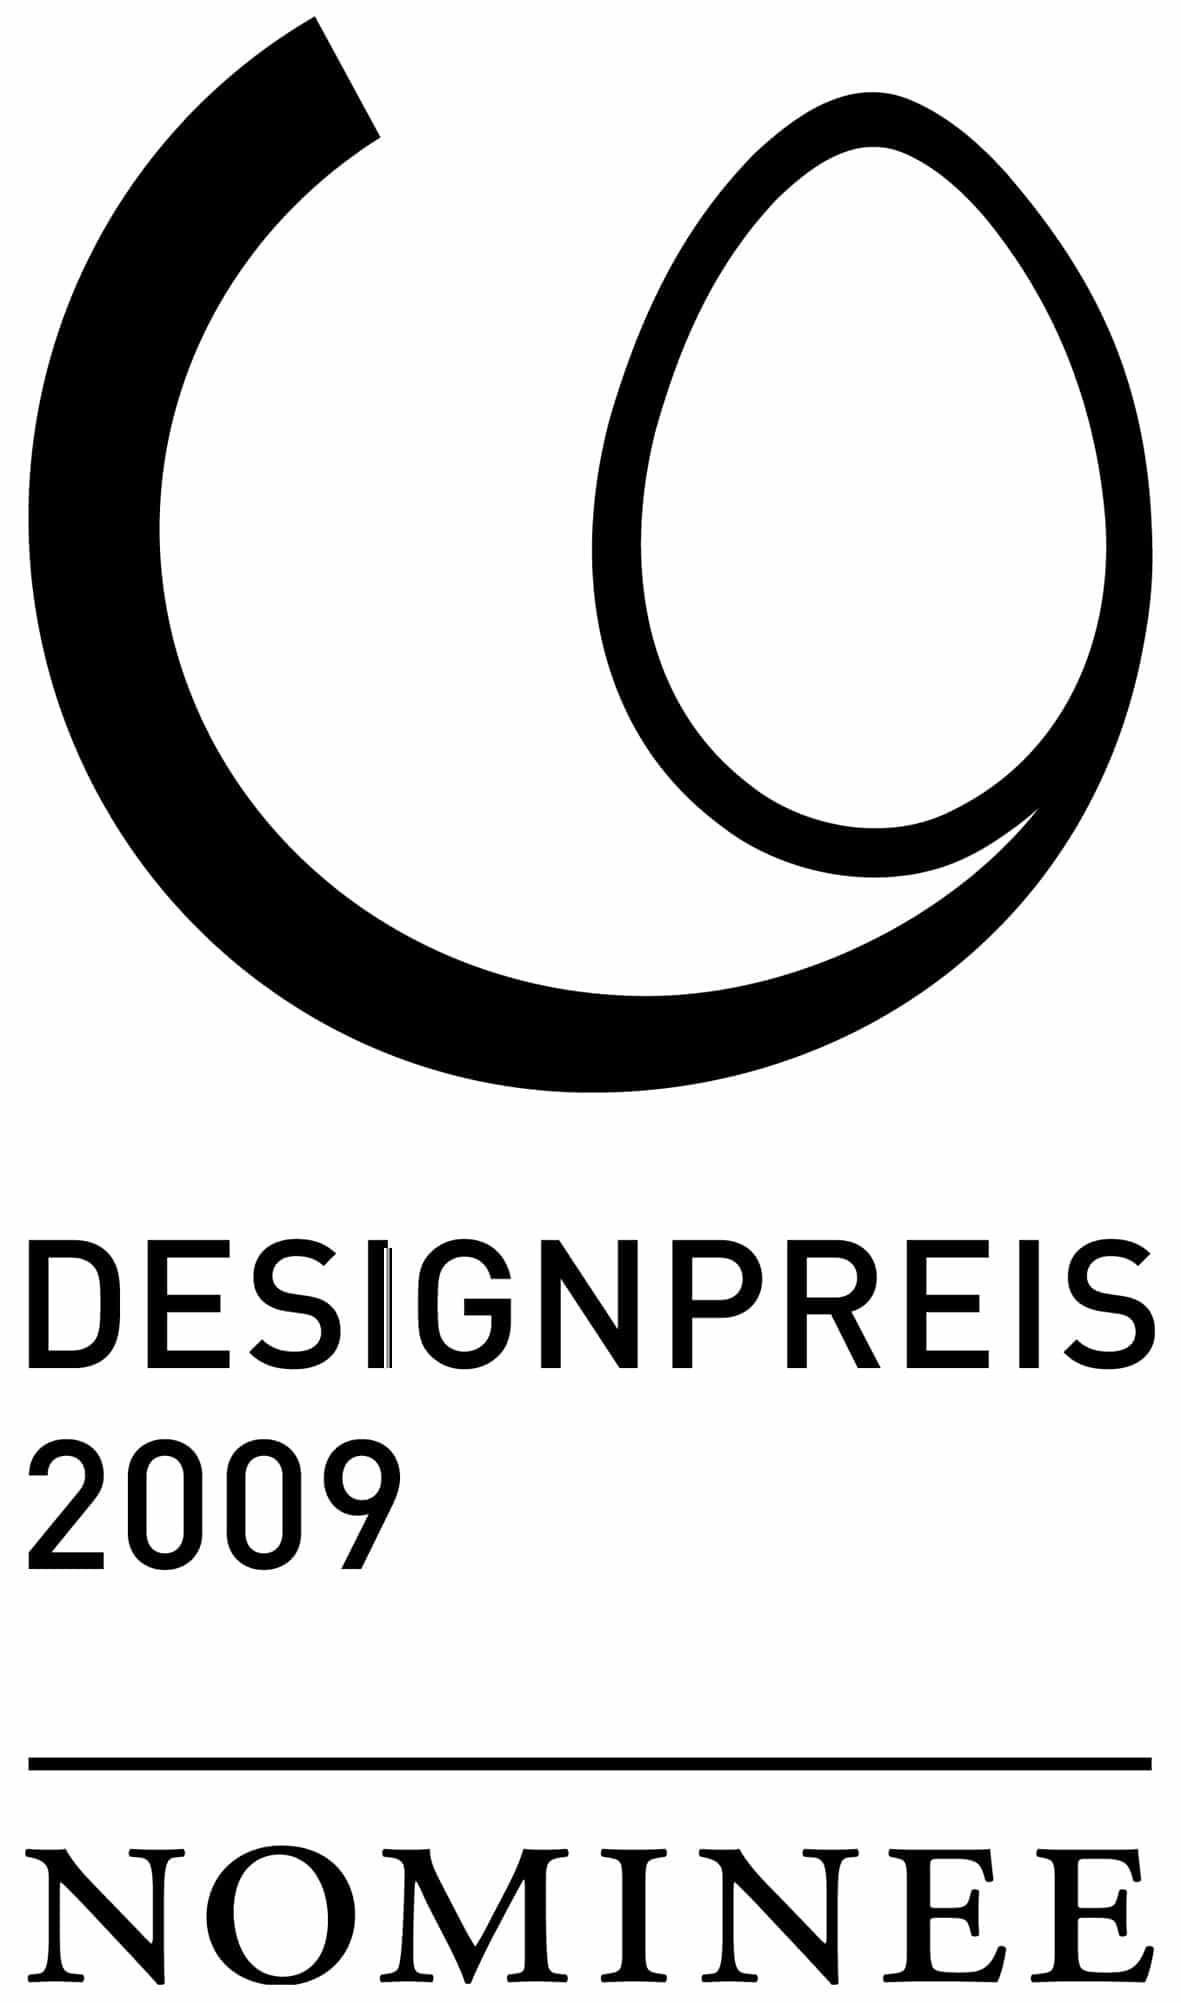 sonoro nominee designpreis 2019